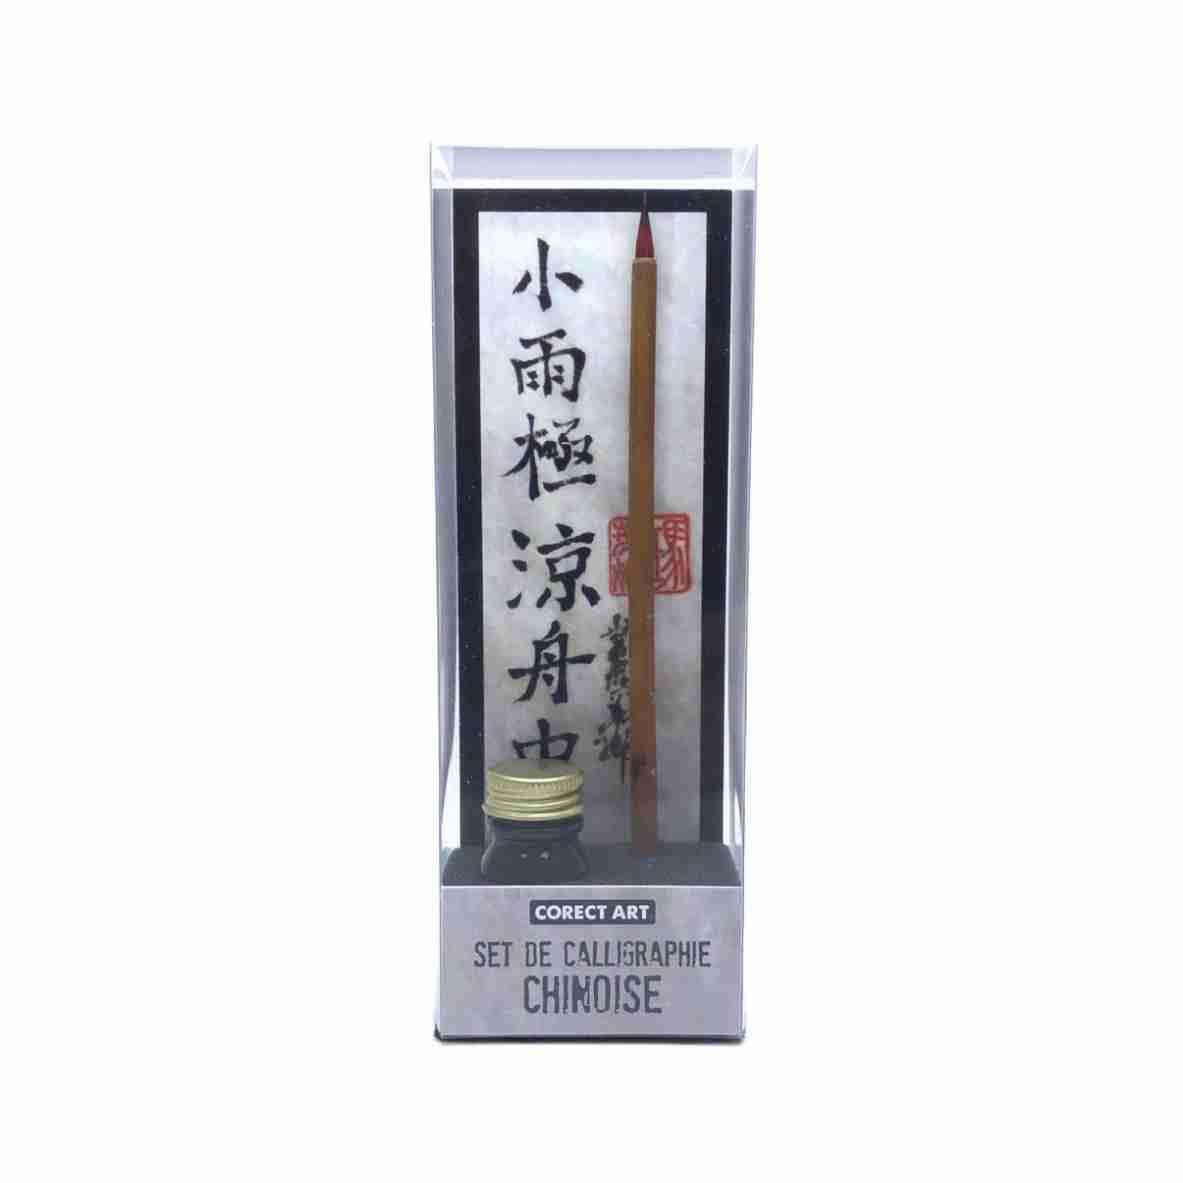 Set de calligraphie chinoise